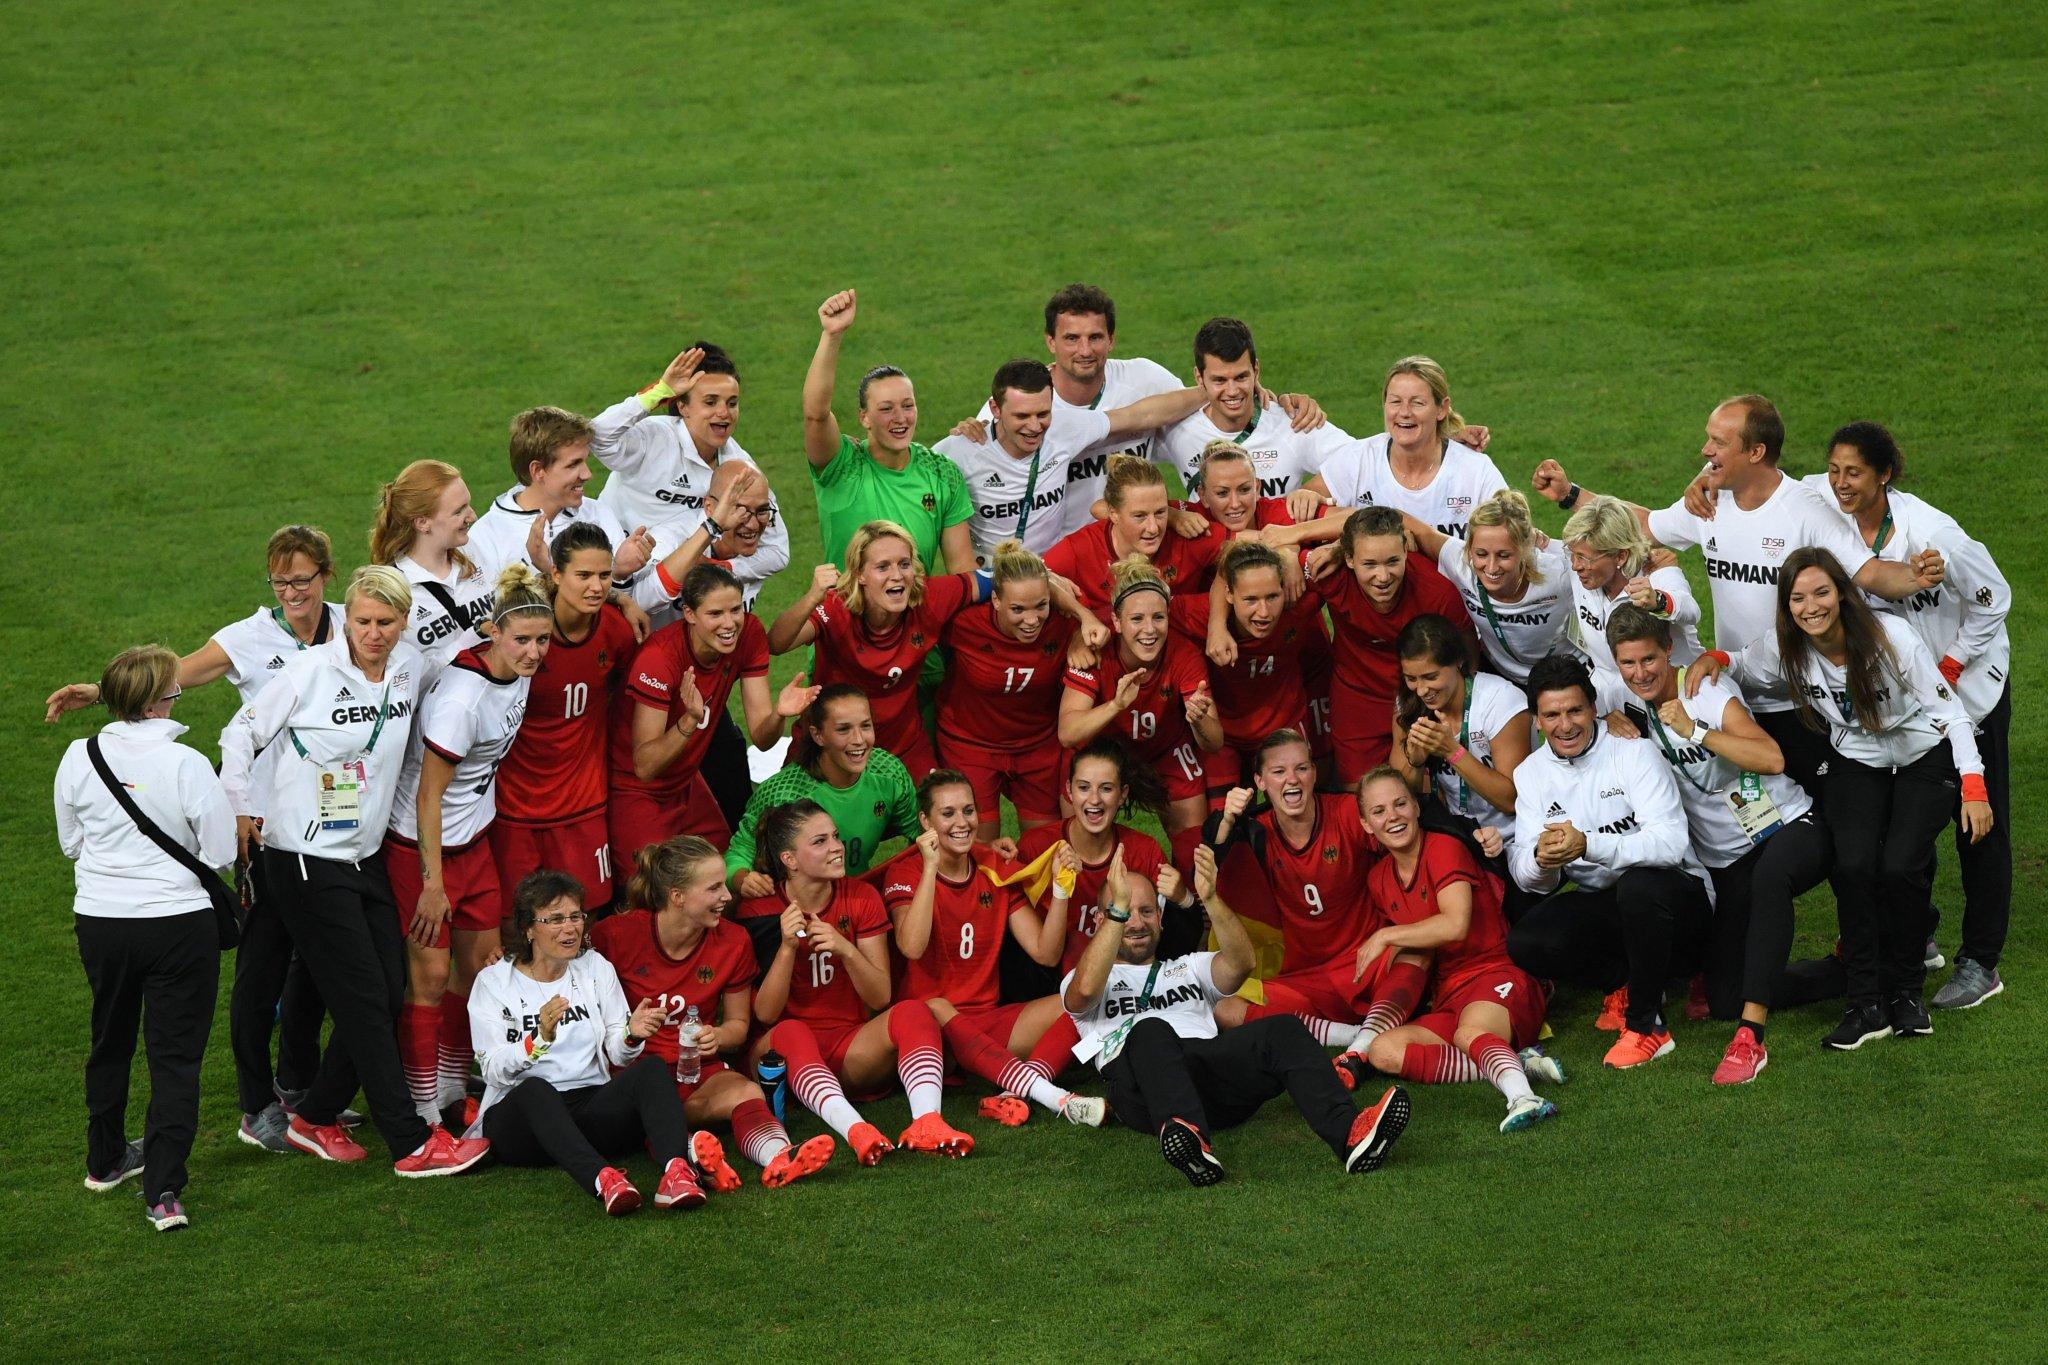 (photo Getty Images/FIFA.com)